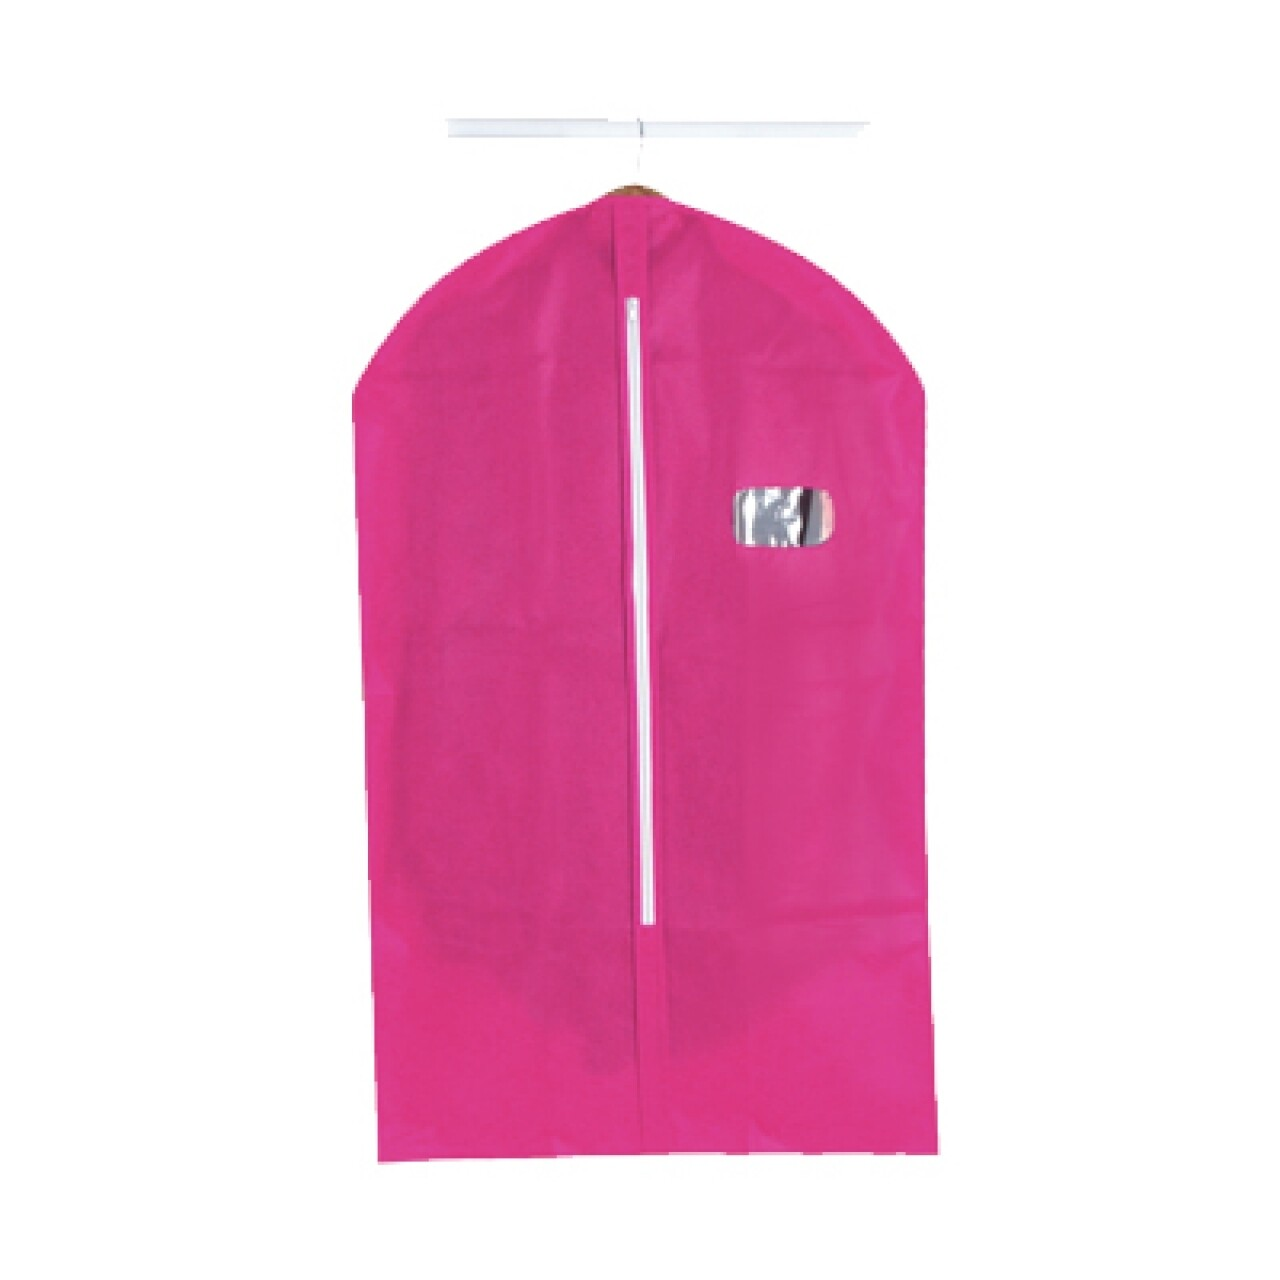 Husa pentru haine Jocca Fuchsia, 60x101 cm, PEVA, roz